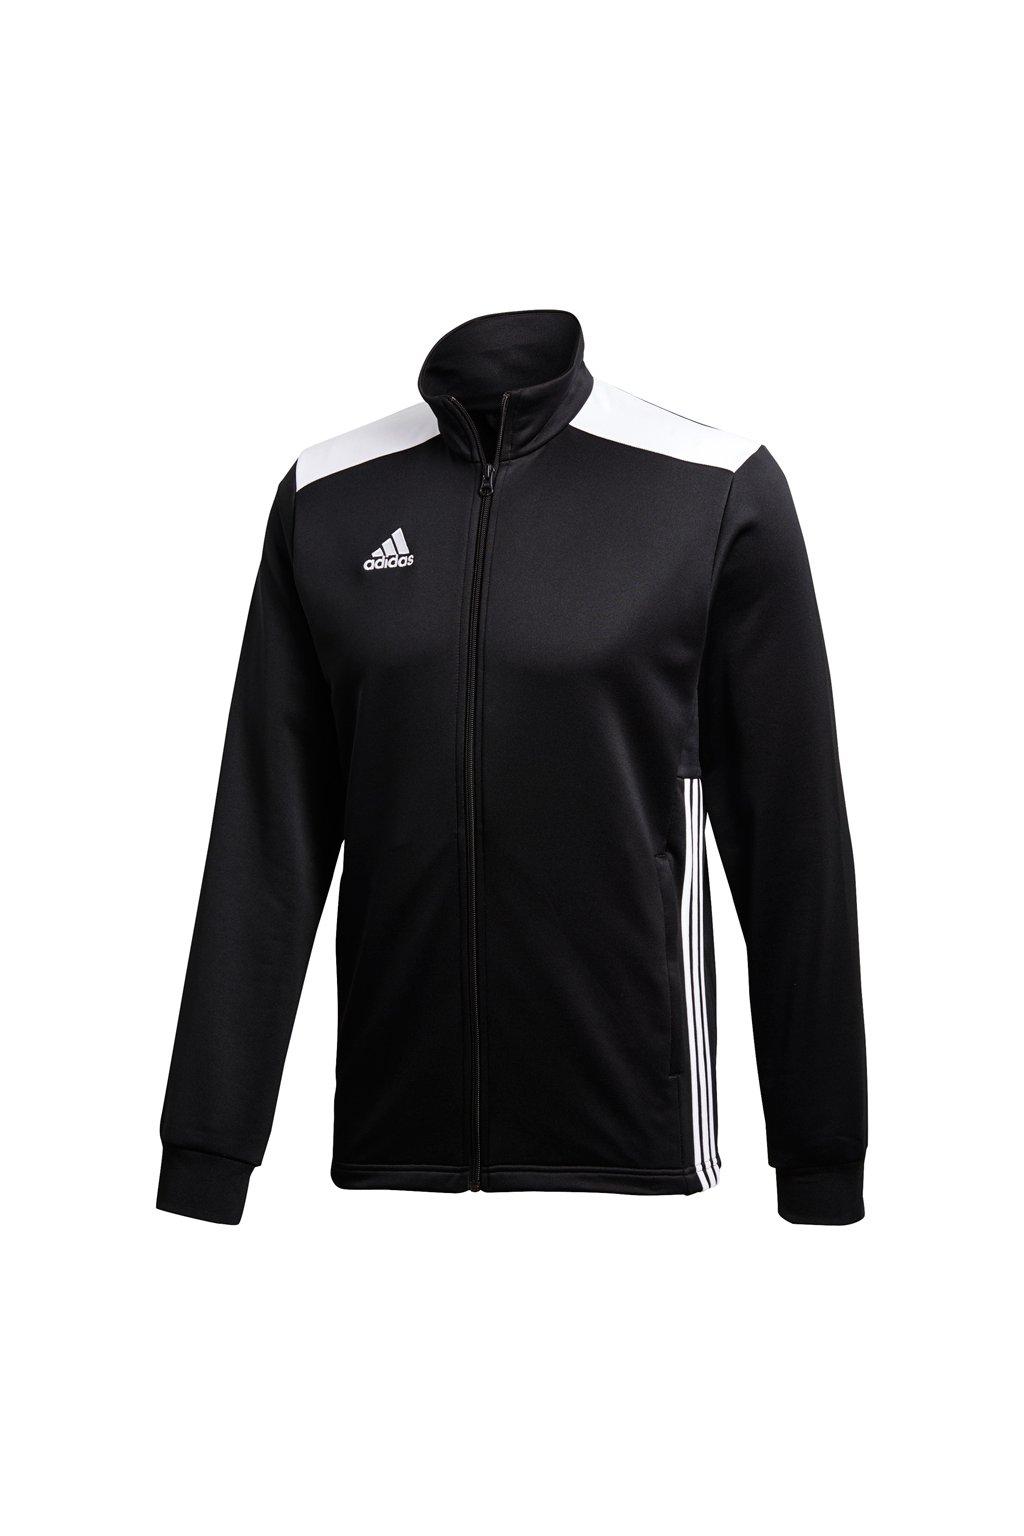 Bunda Adidas Regista 18 Polyester black CZ8624